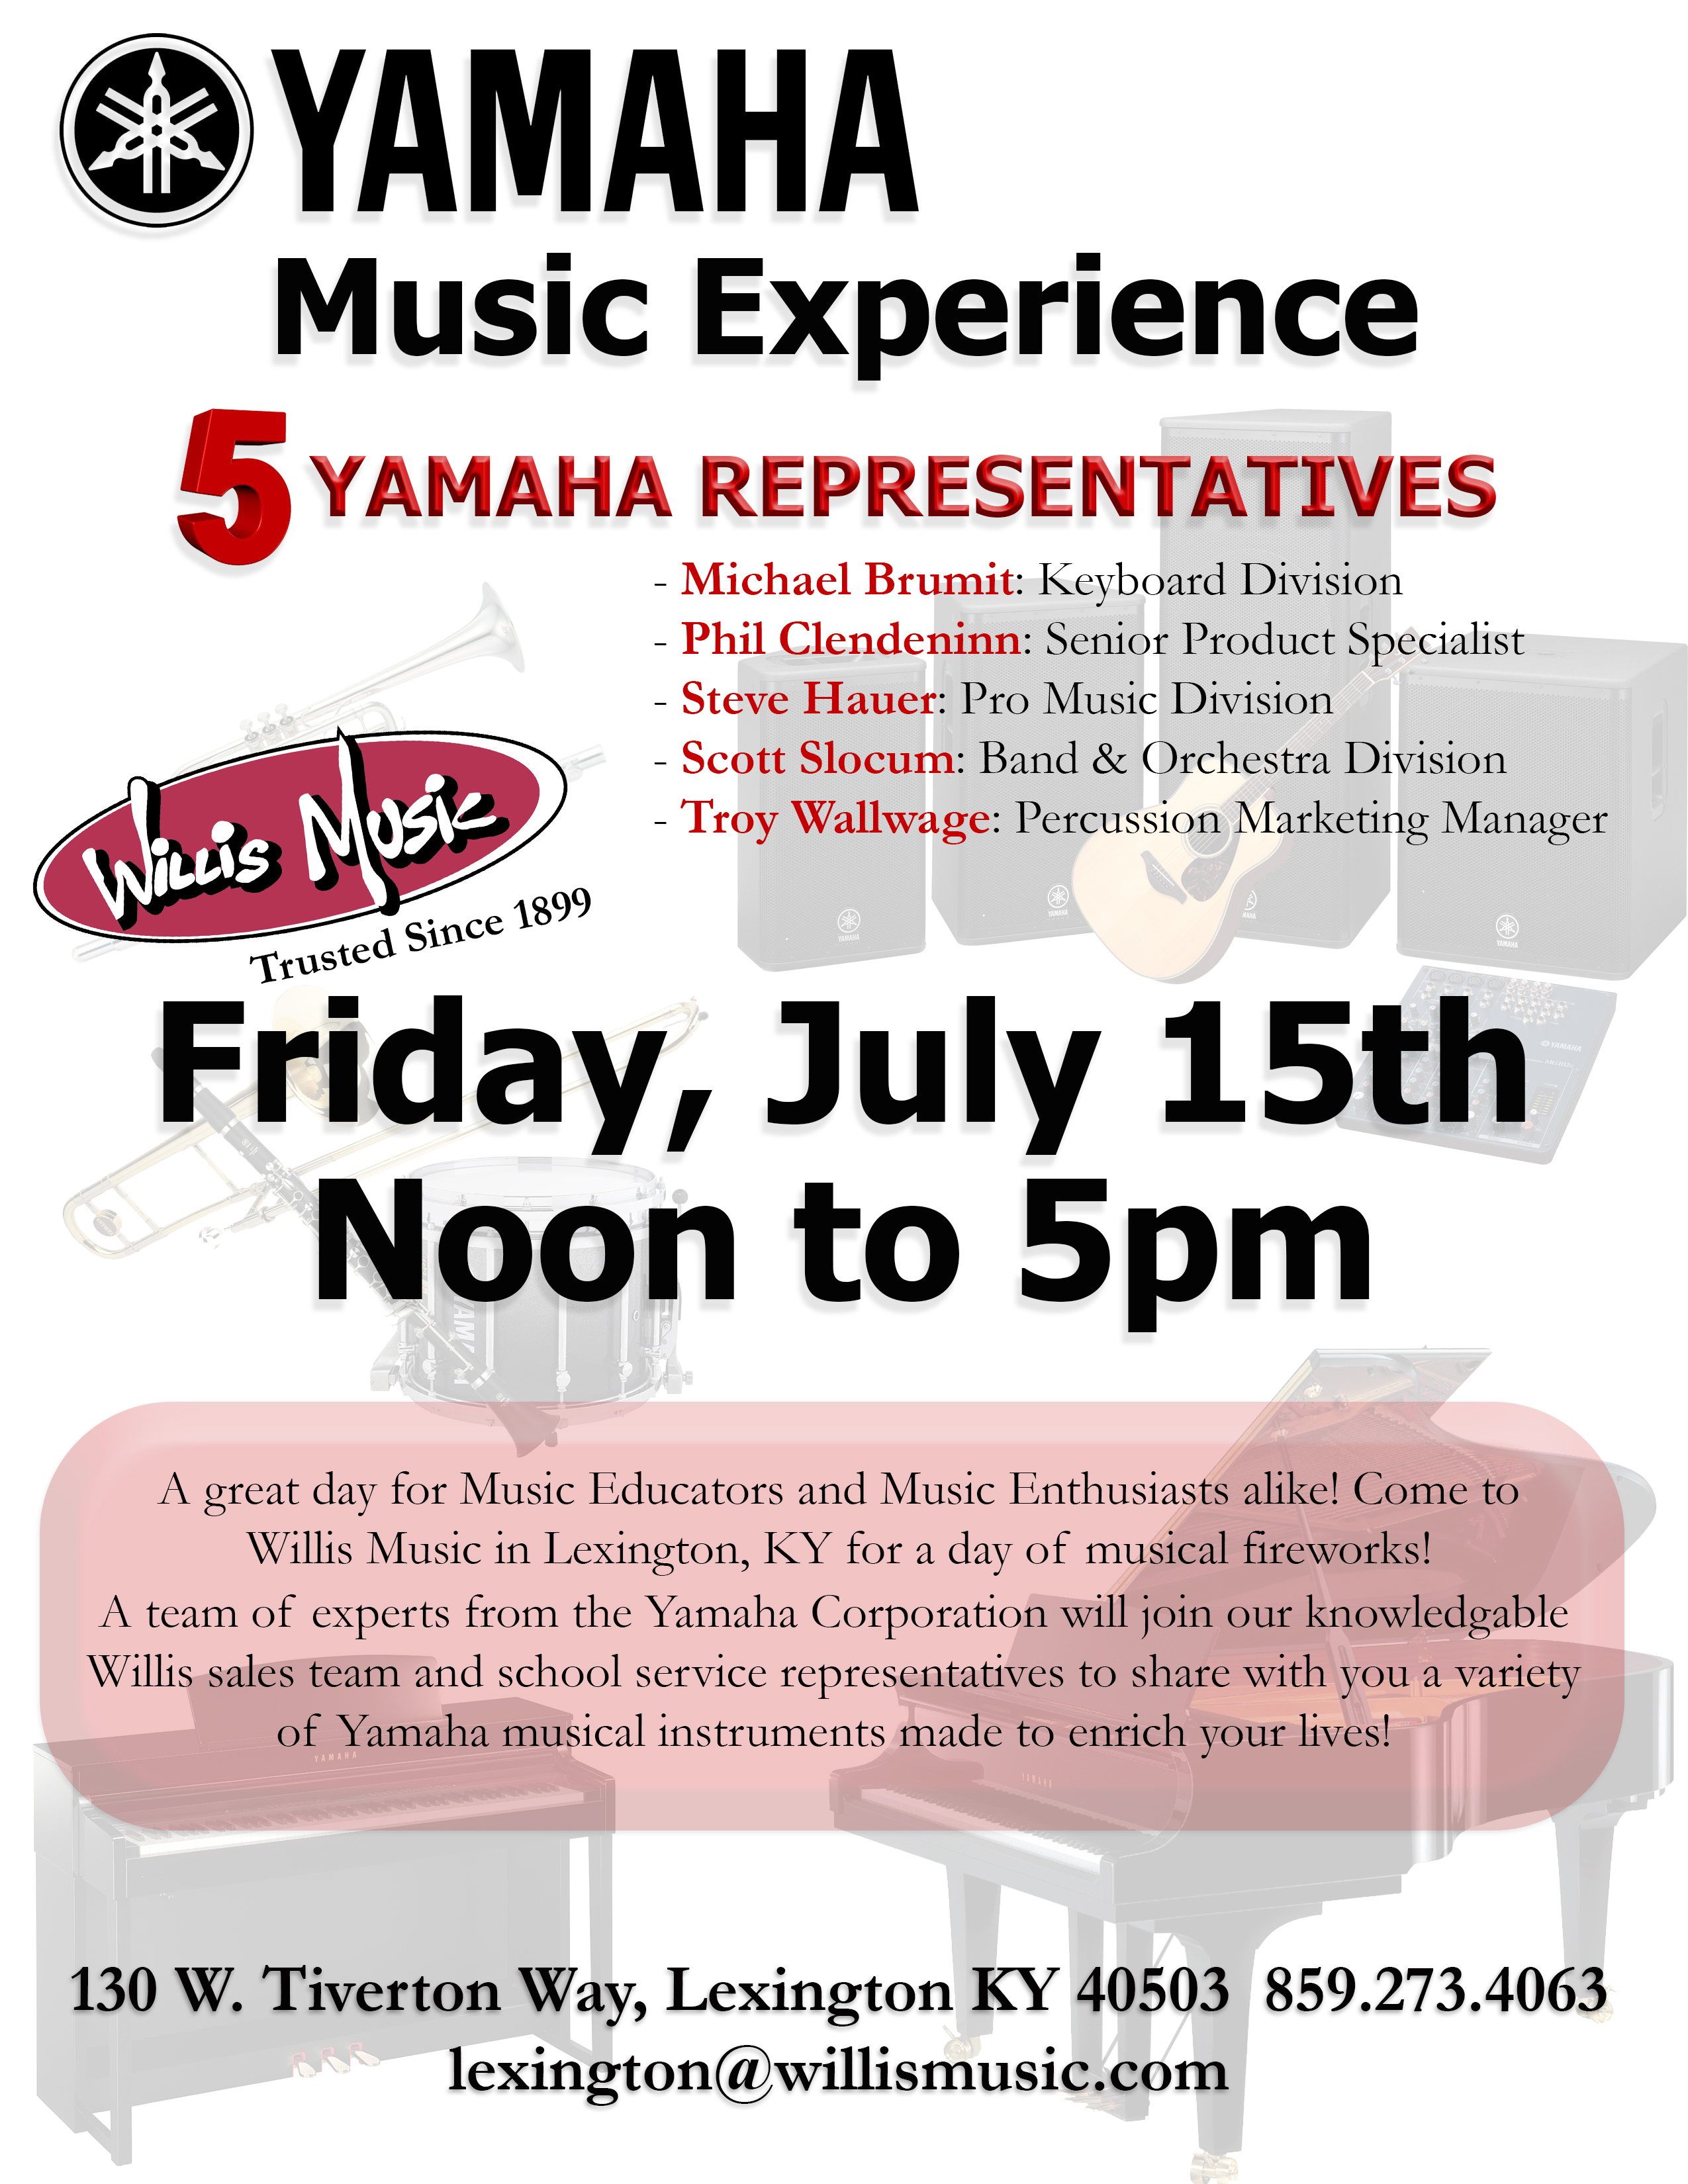 Yamaha Music Experience Flyer